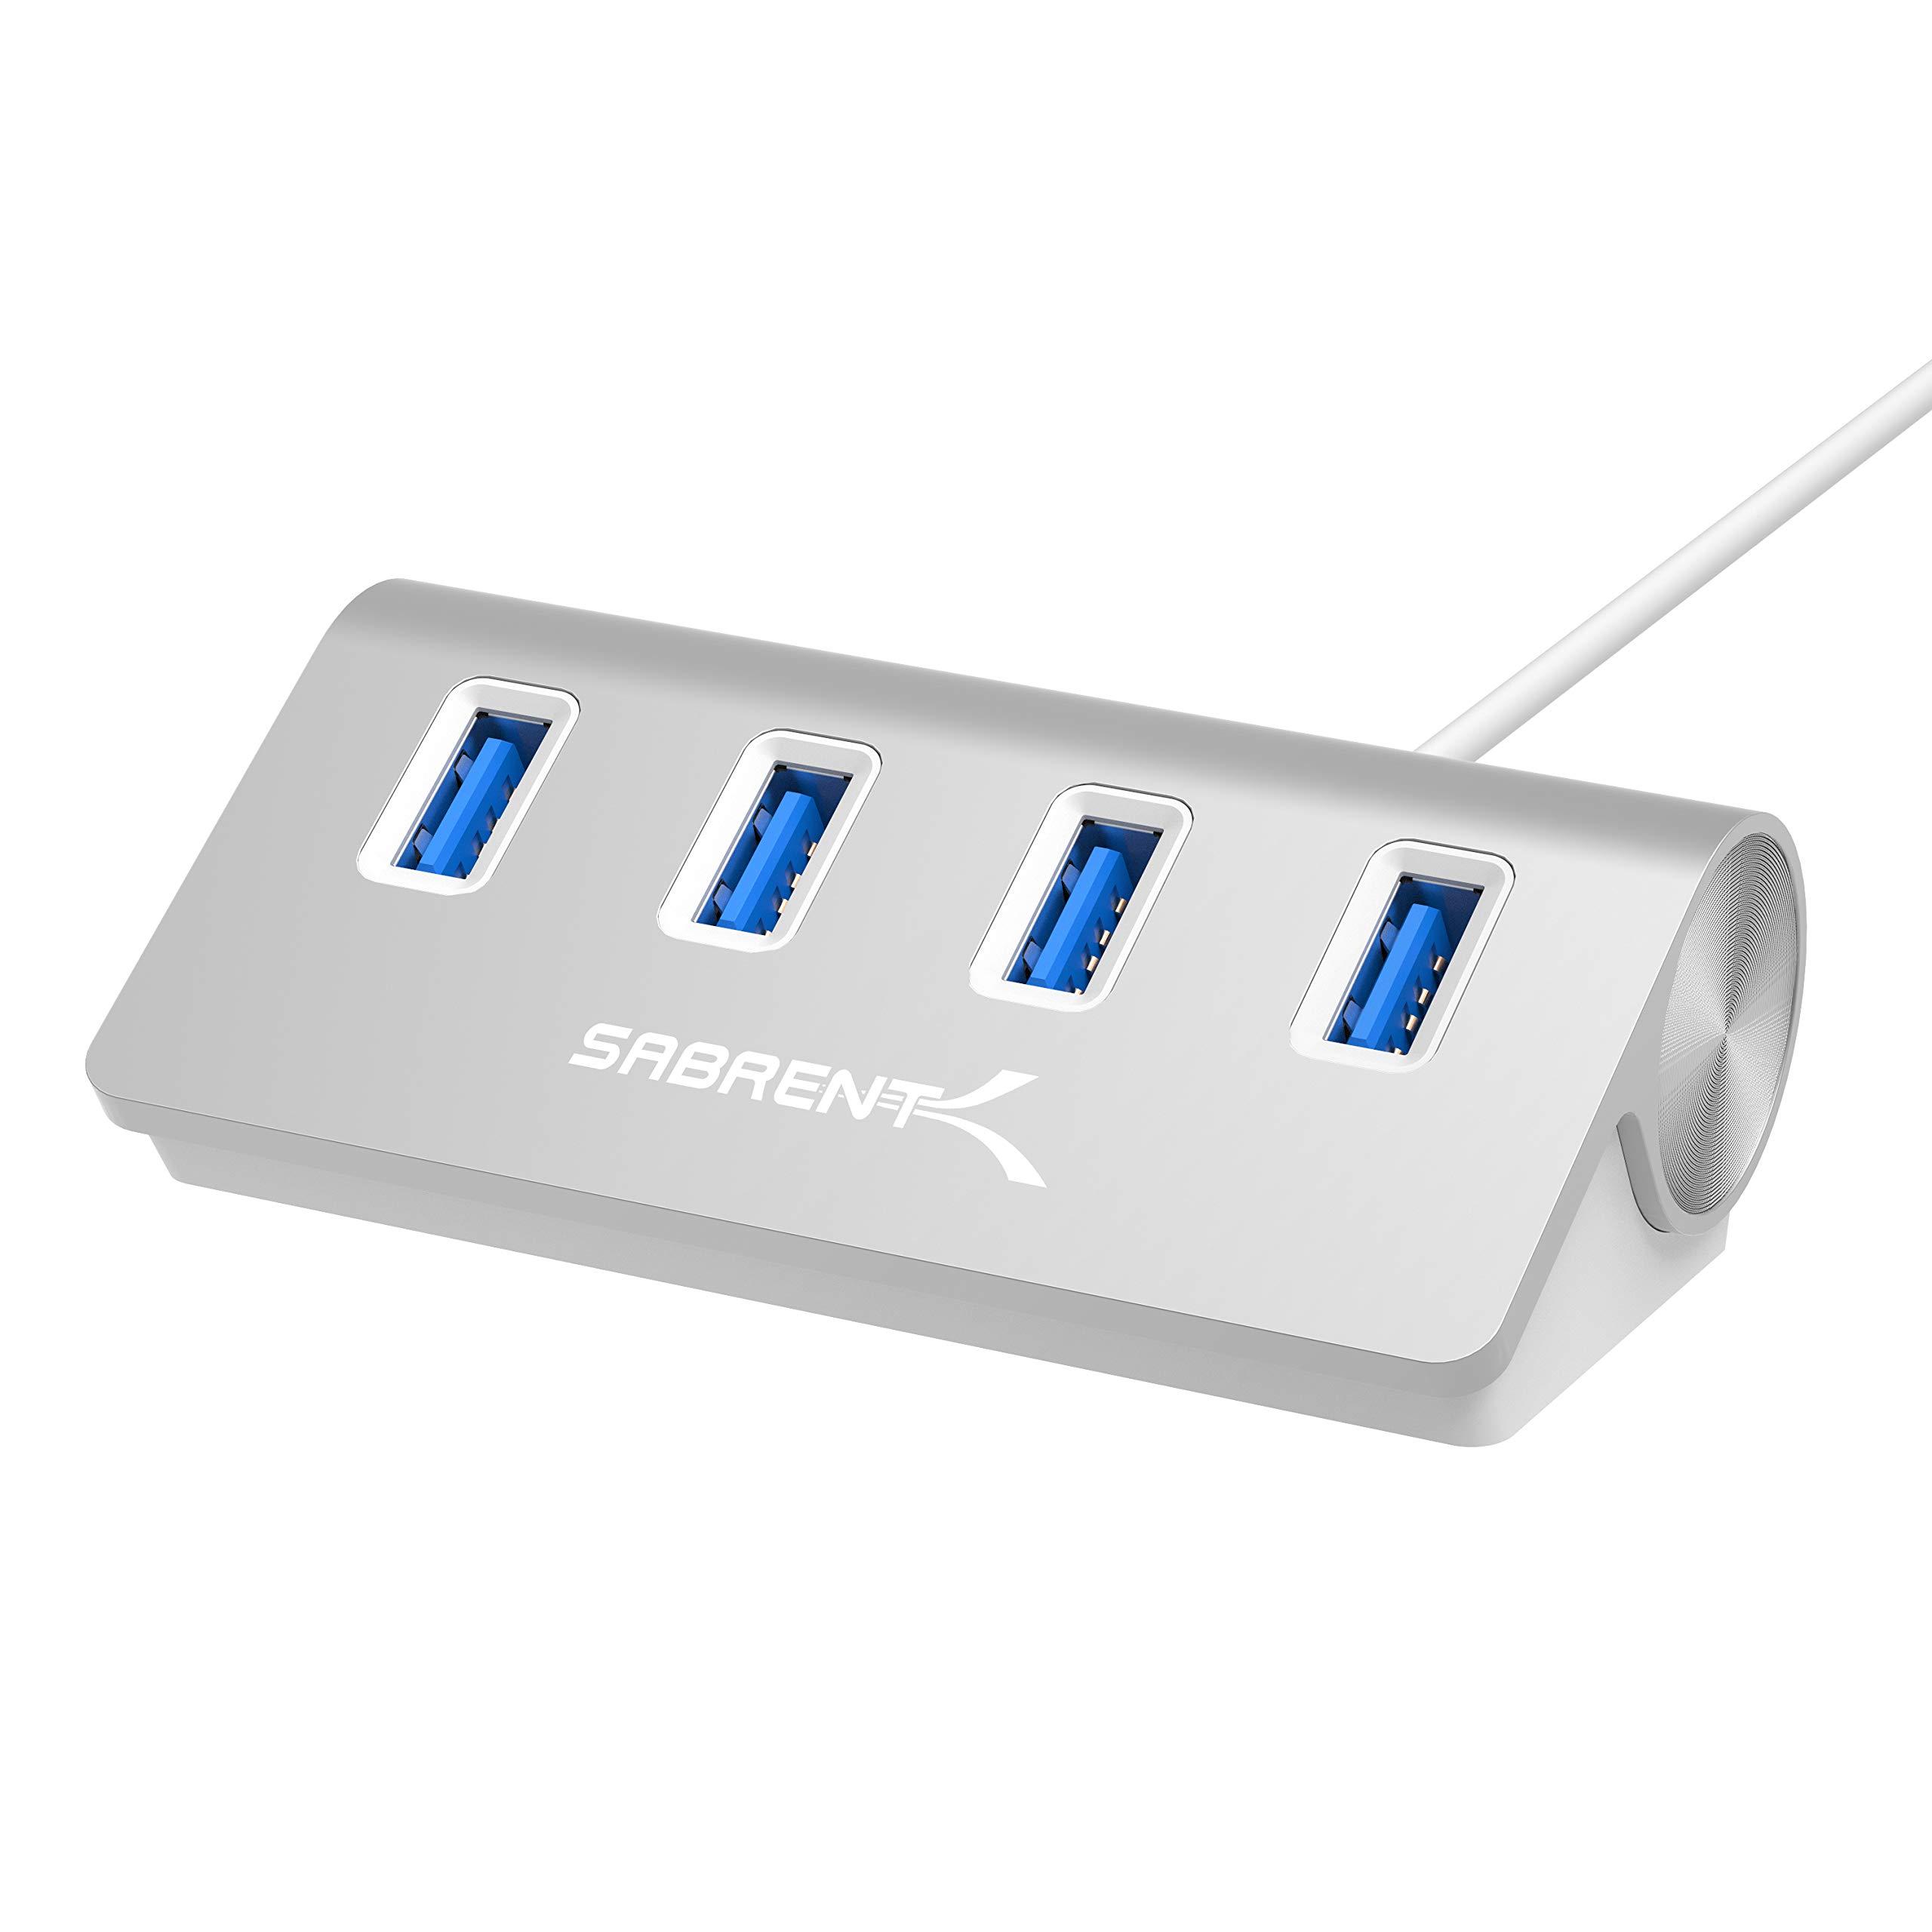 Sabrent Premium 4 Port Aluminum USB 3.0 Hub (30'' cable) for iMac, MacBook, MacBook Pro, MacBook Air, Mac Mini, or any PC [Silver] (HB-MAC3)